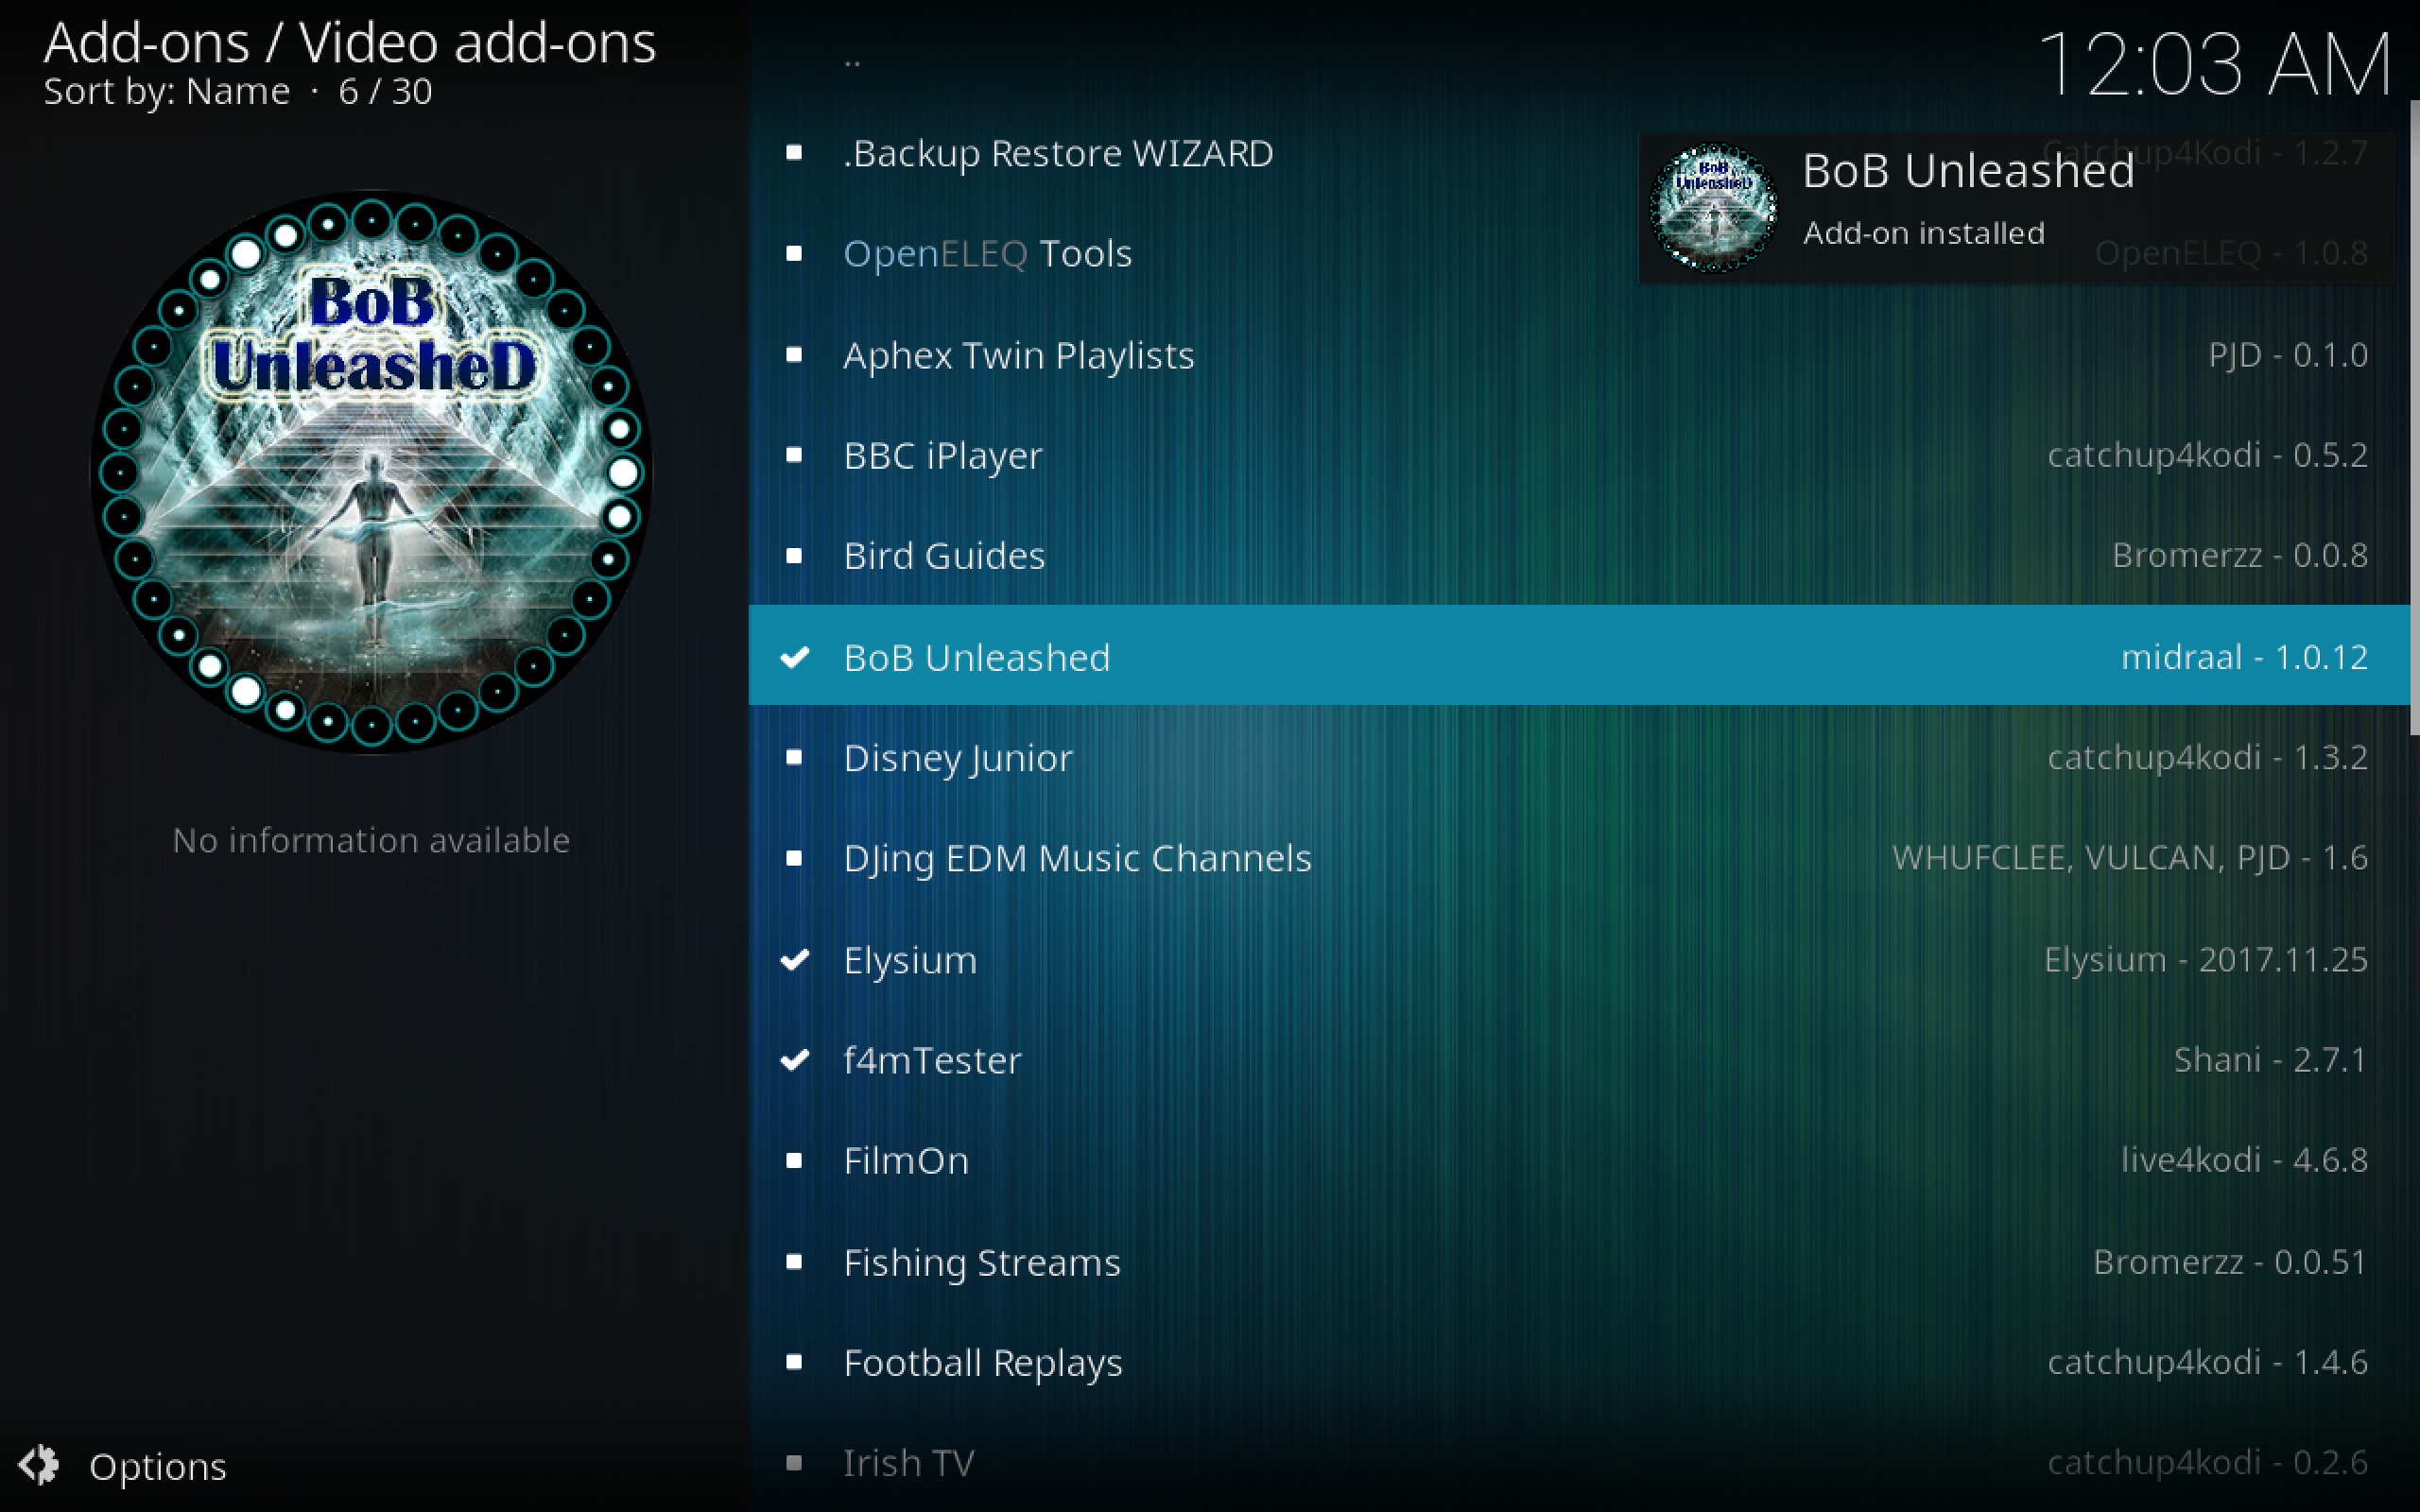 BoB Kodi Add-on Installed via Noobsandnerds